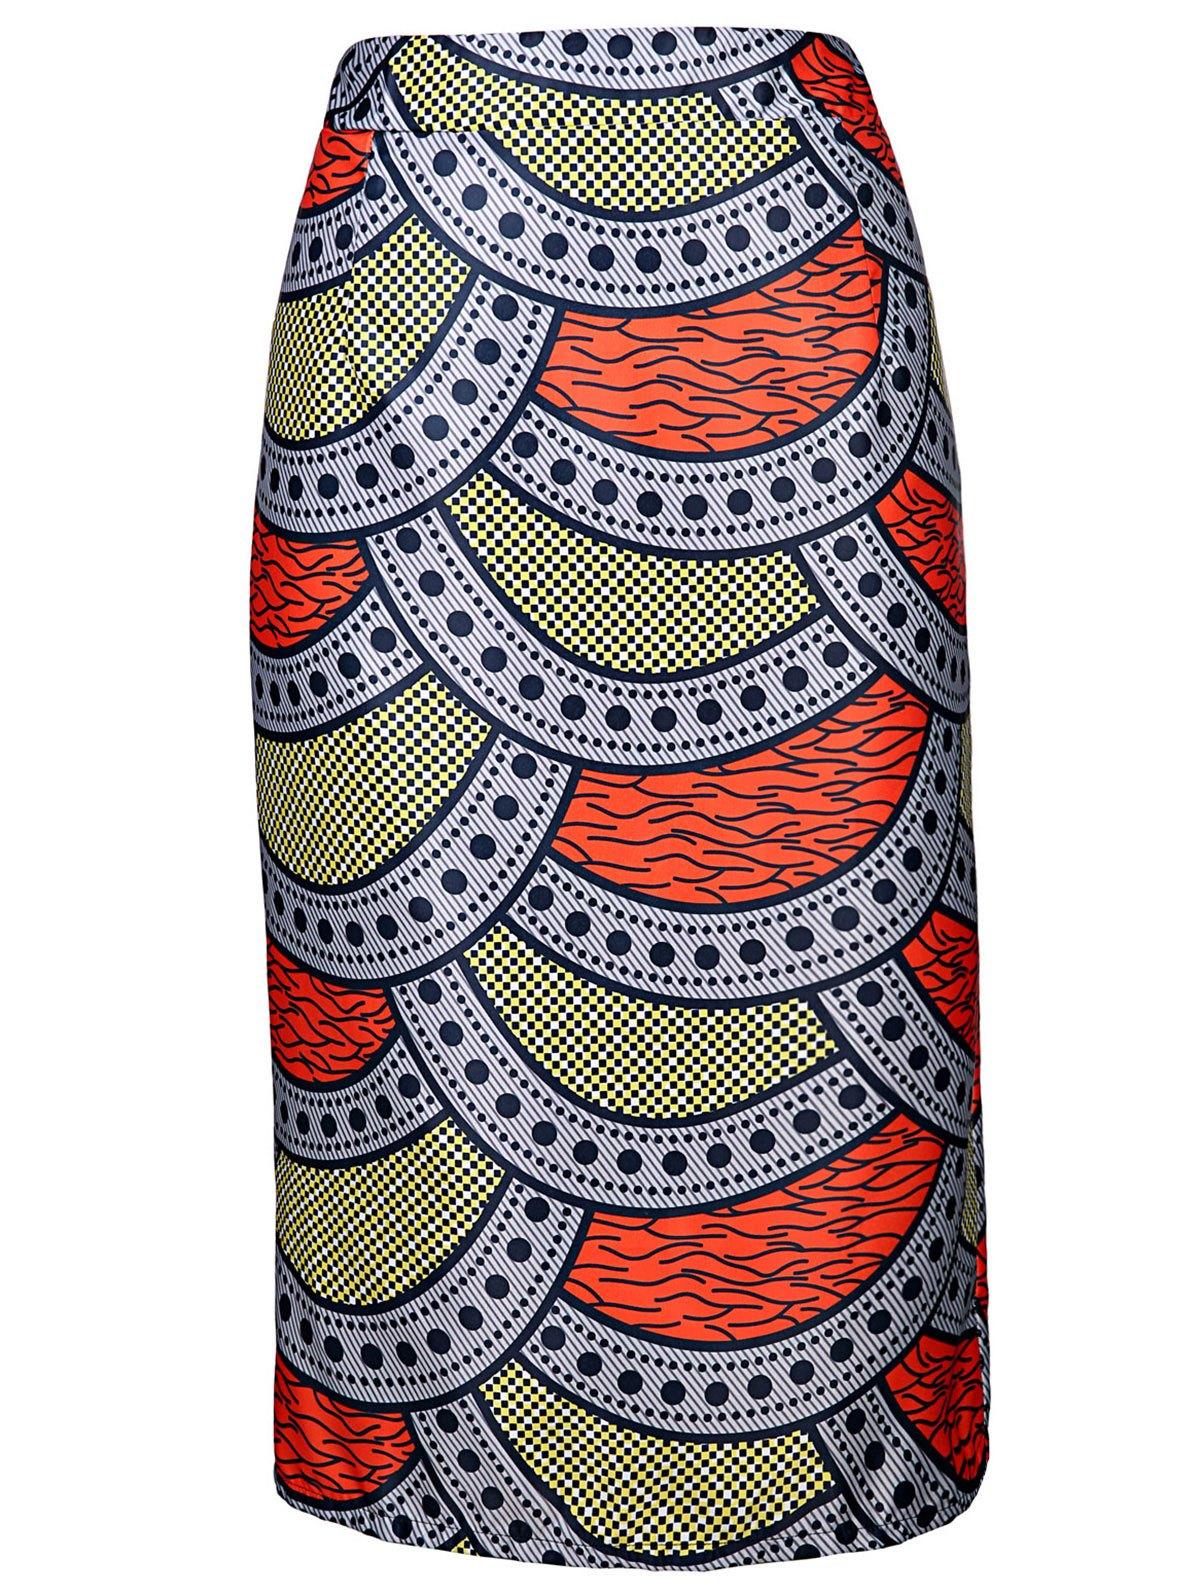 High-Waisted Printed Pencil Skirt